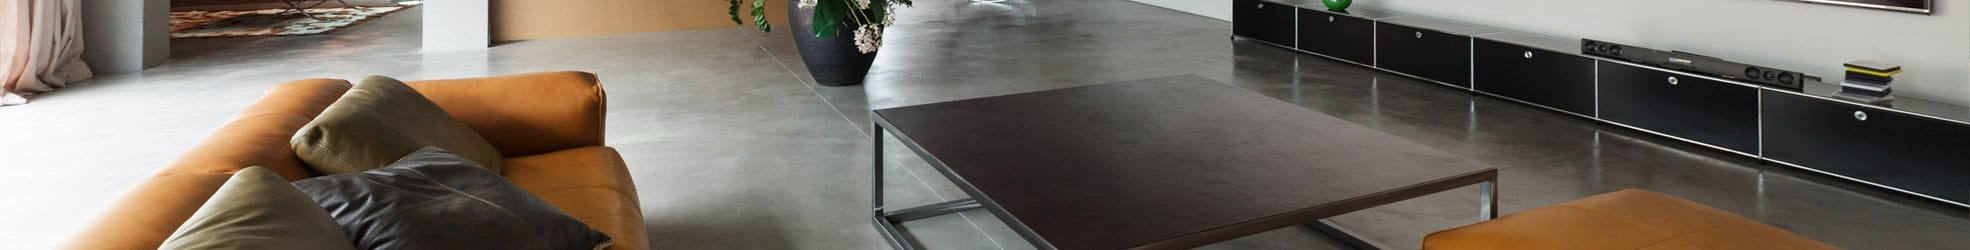 Vloer van beton